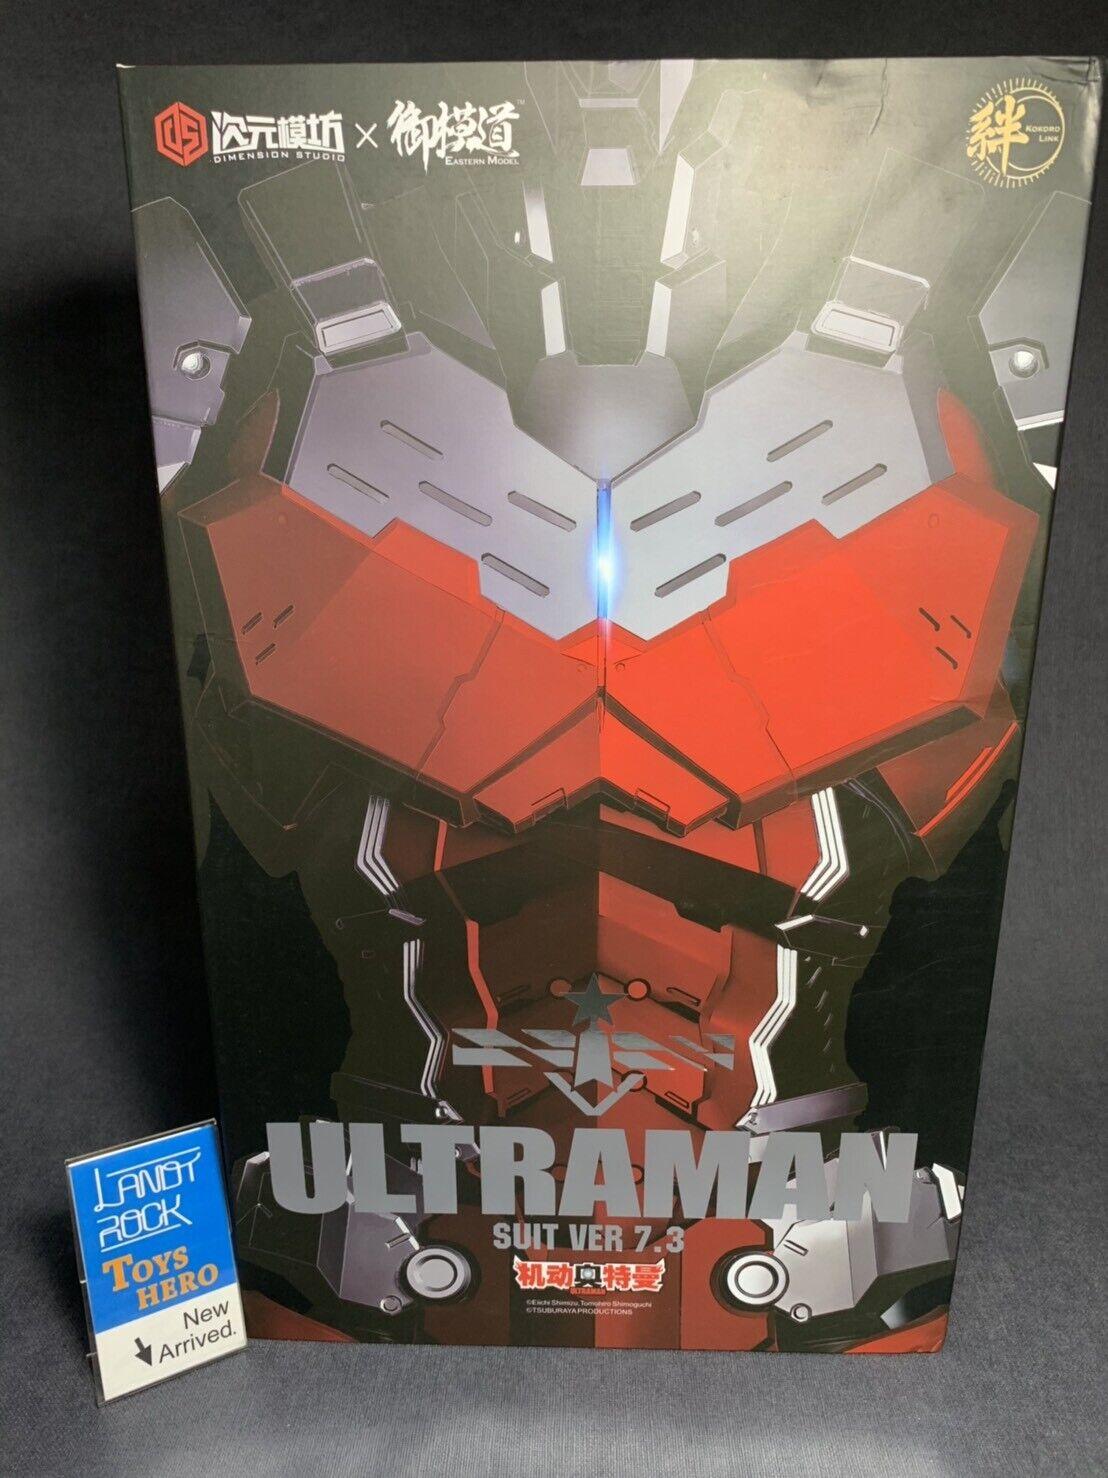 [Toys Hero] Hero] Hero] In Hand X Model Principle 1 6 Ultraman Ultra Seven Suit 7.3 Diecast 36a925